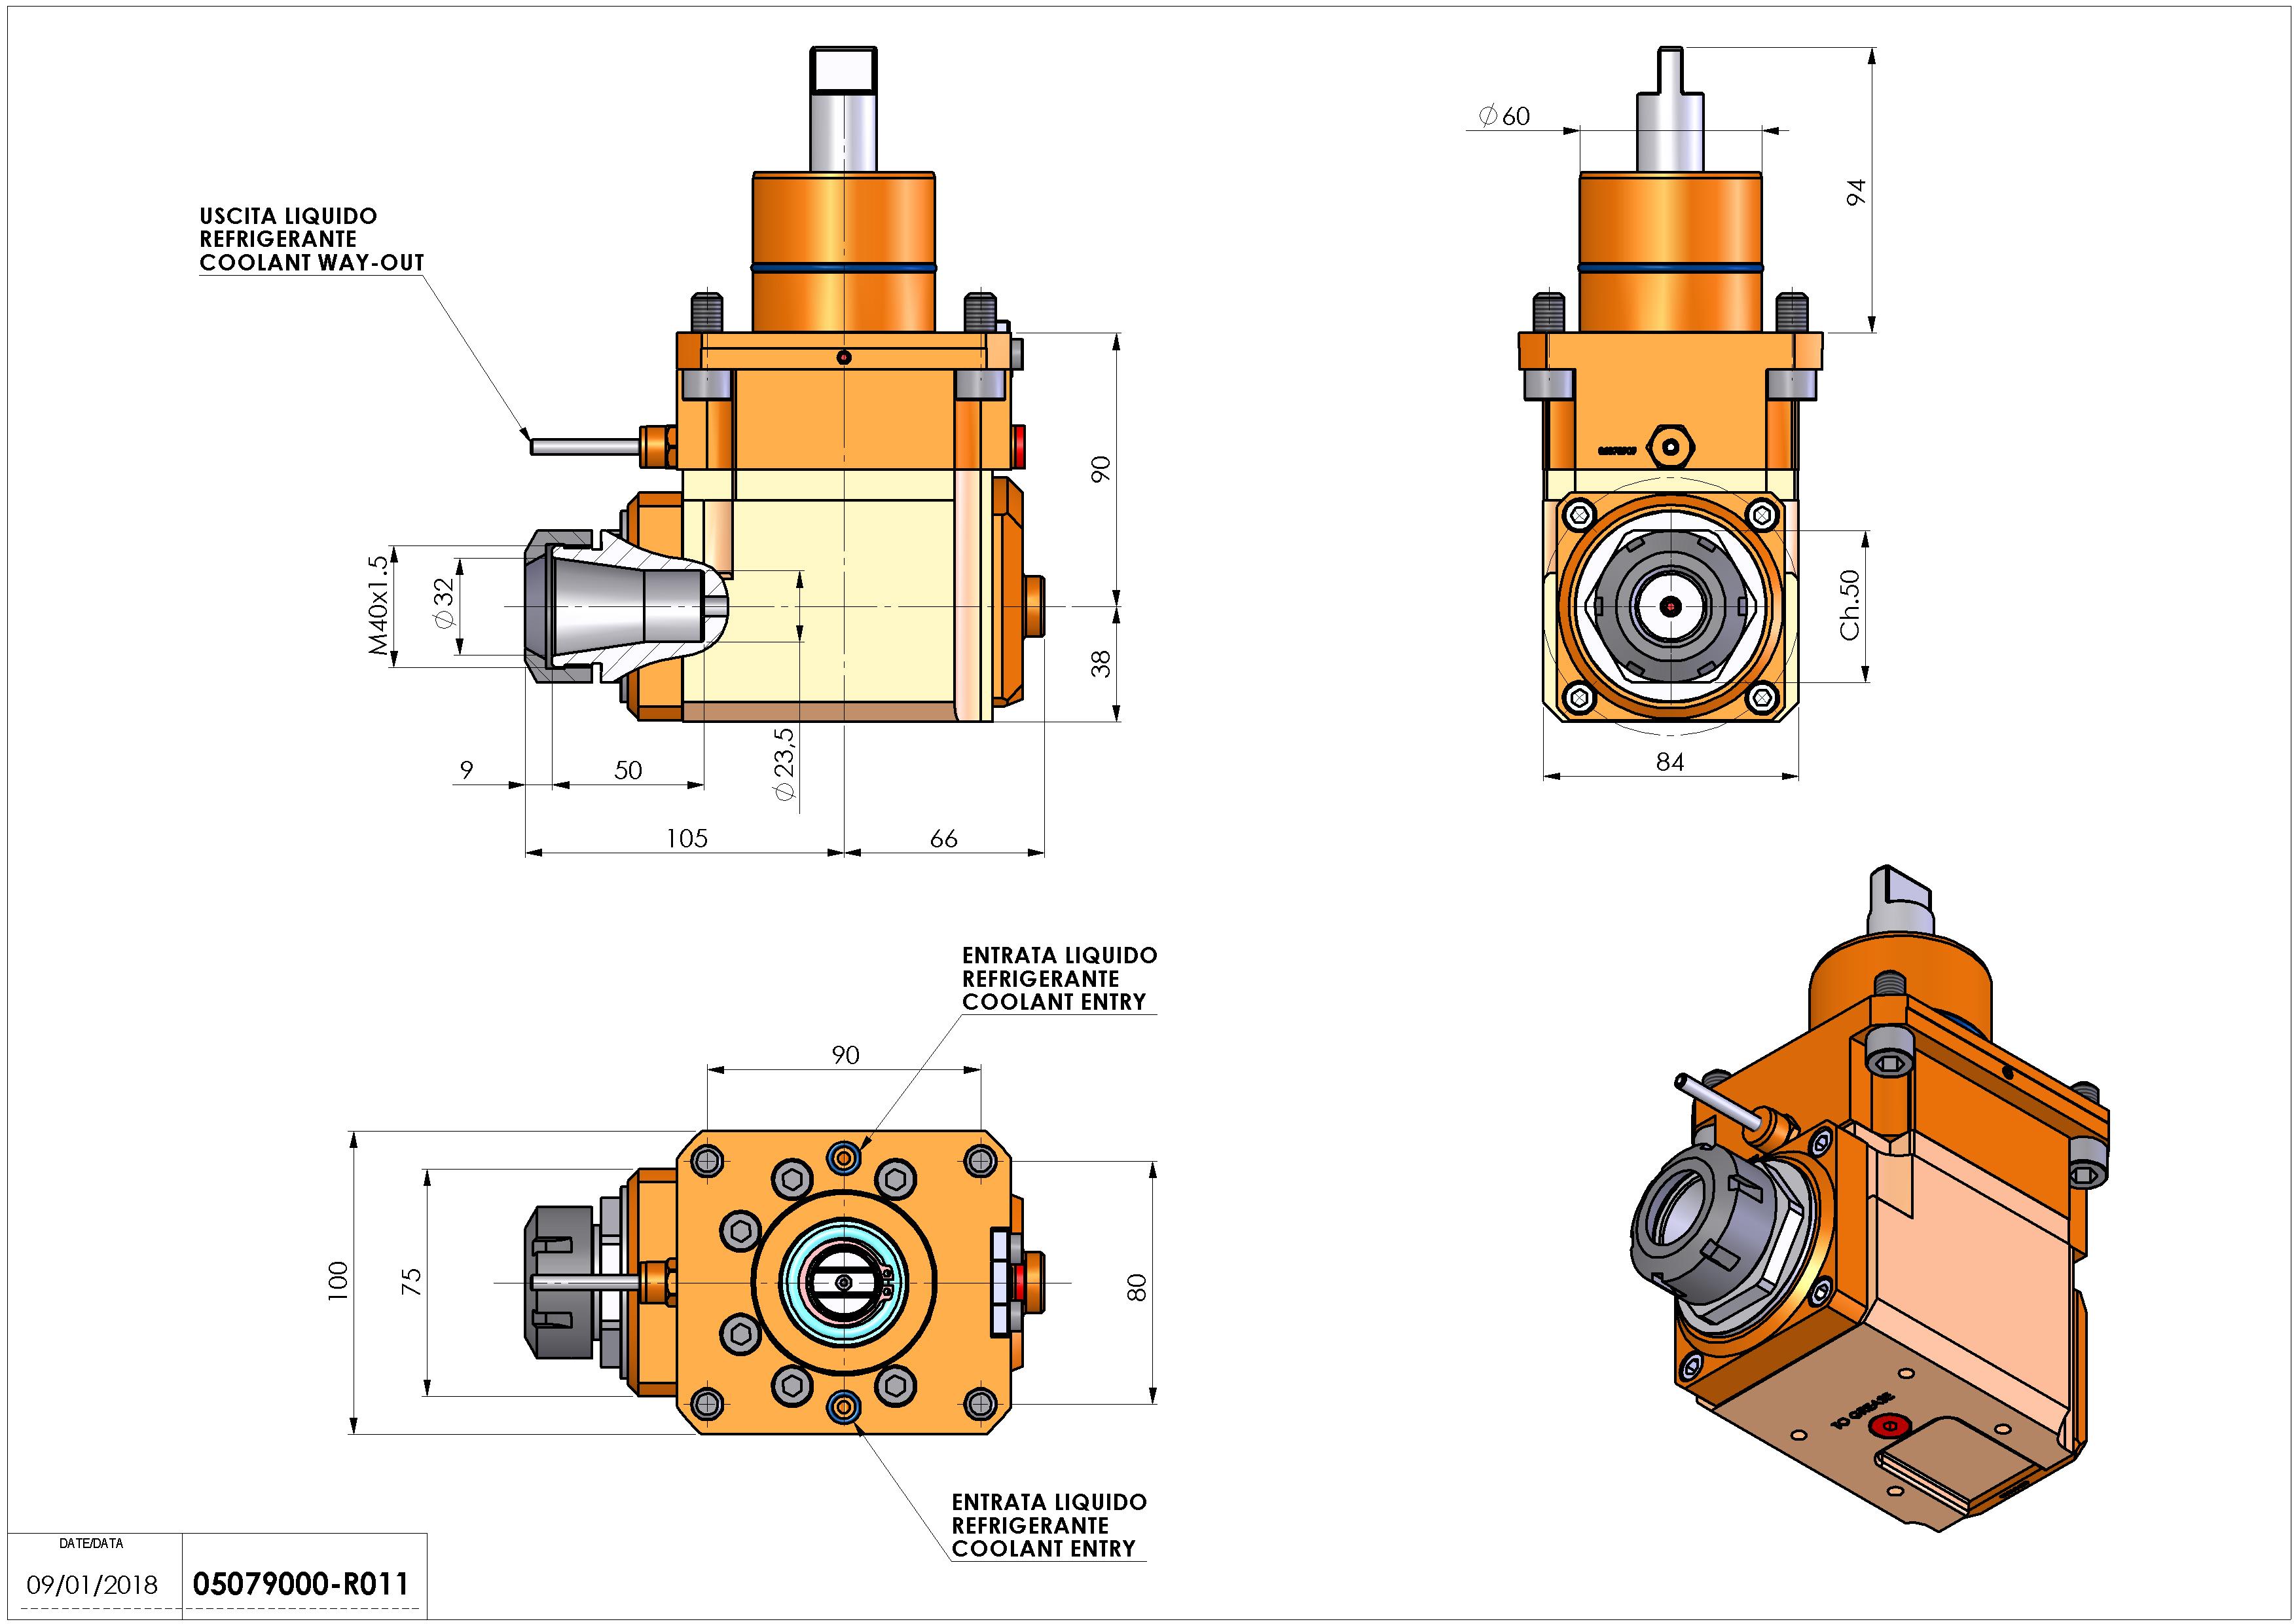 Technical image - LT-A D60 ER32 LR H90.